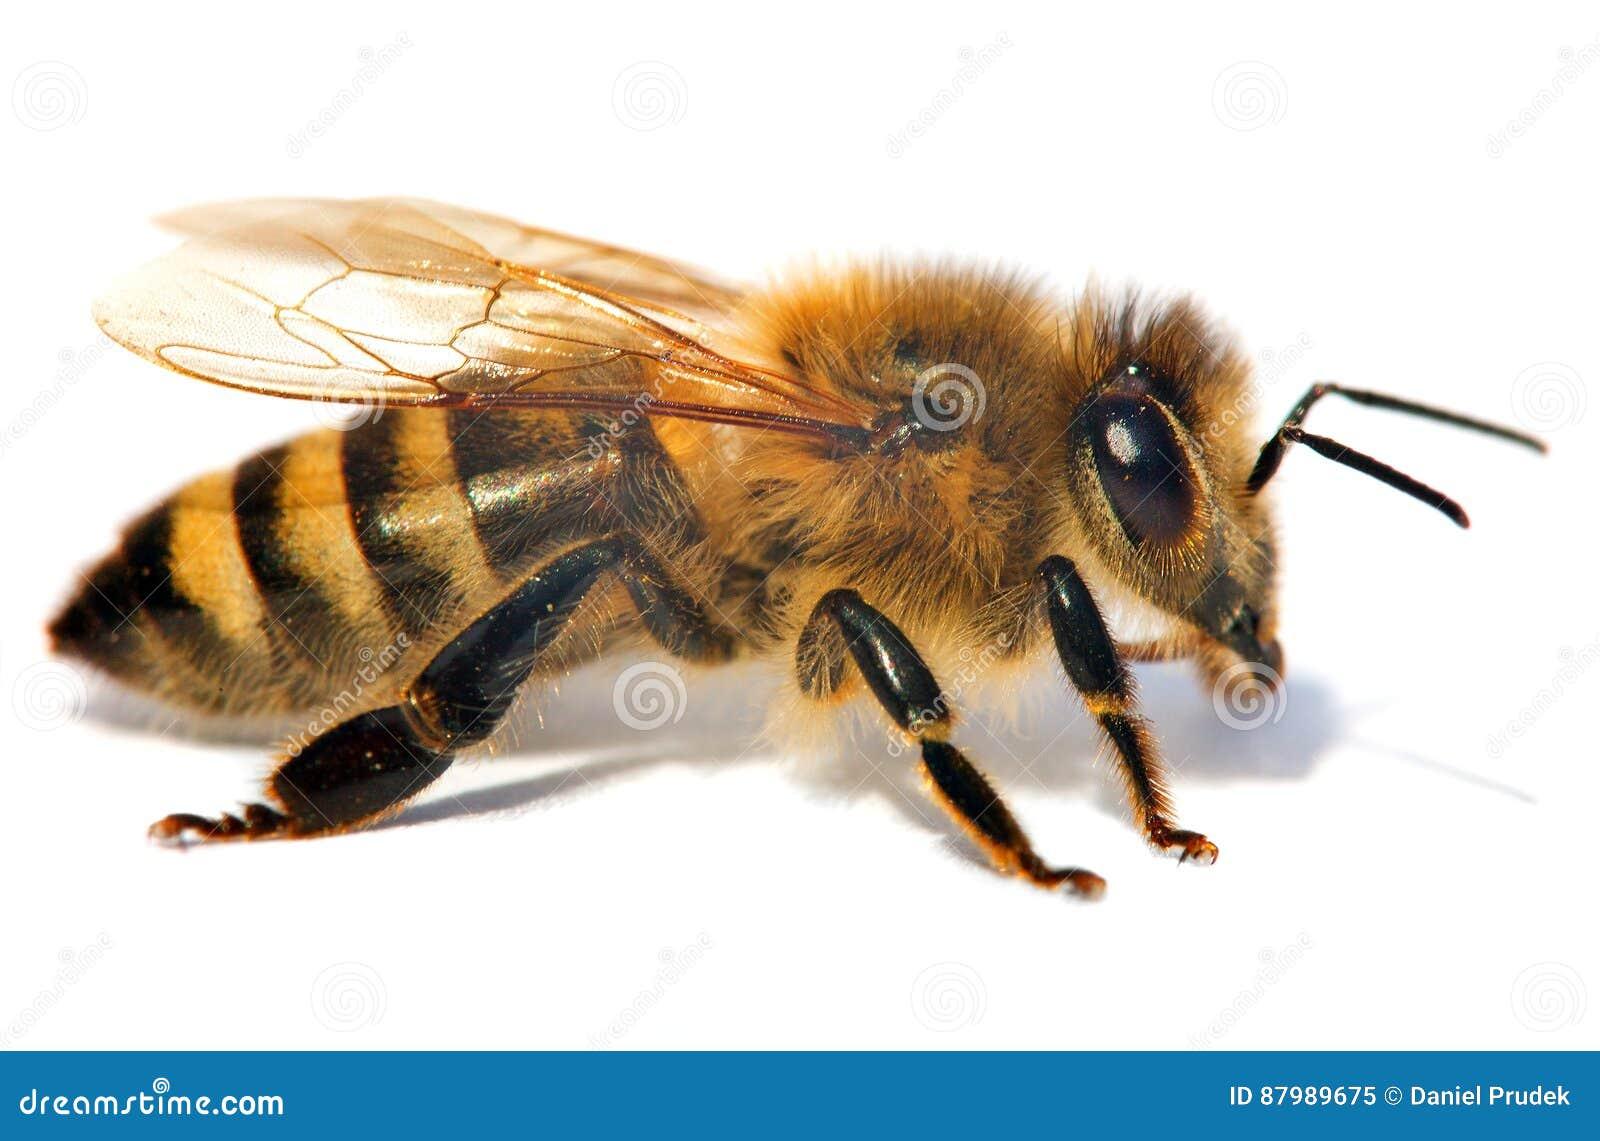 Detalj av biet eller honungsbit, Apis Mellifera